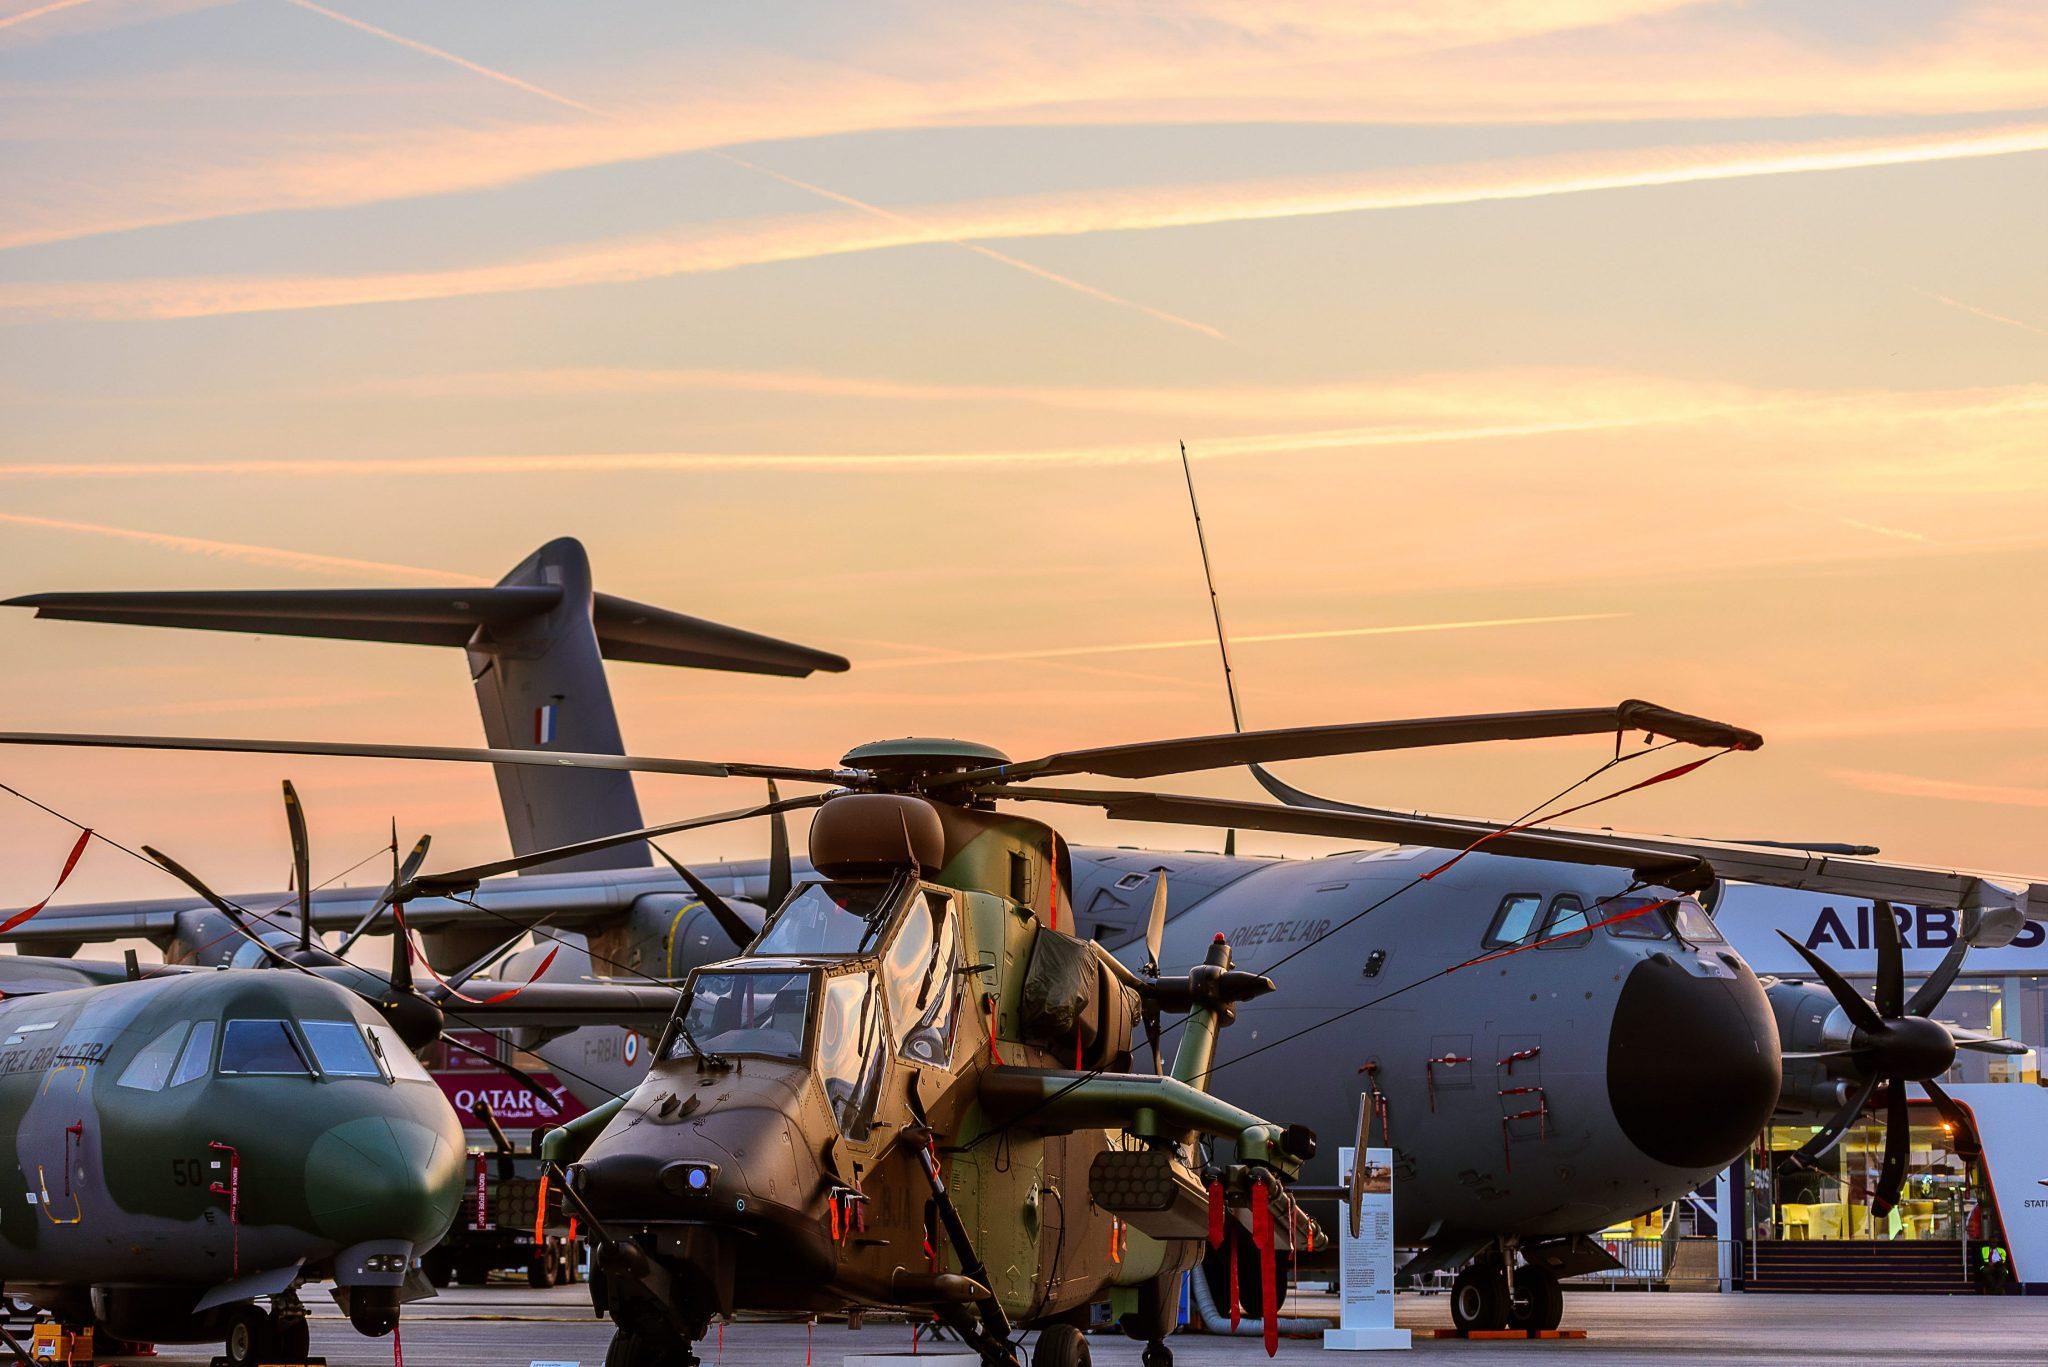 Hélicoptere Tigre - Siae 2017.aeronefs.274 (c) SIAE 2017 - Anthony Guerra & Alex Marc